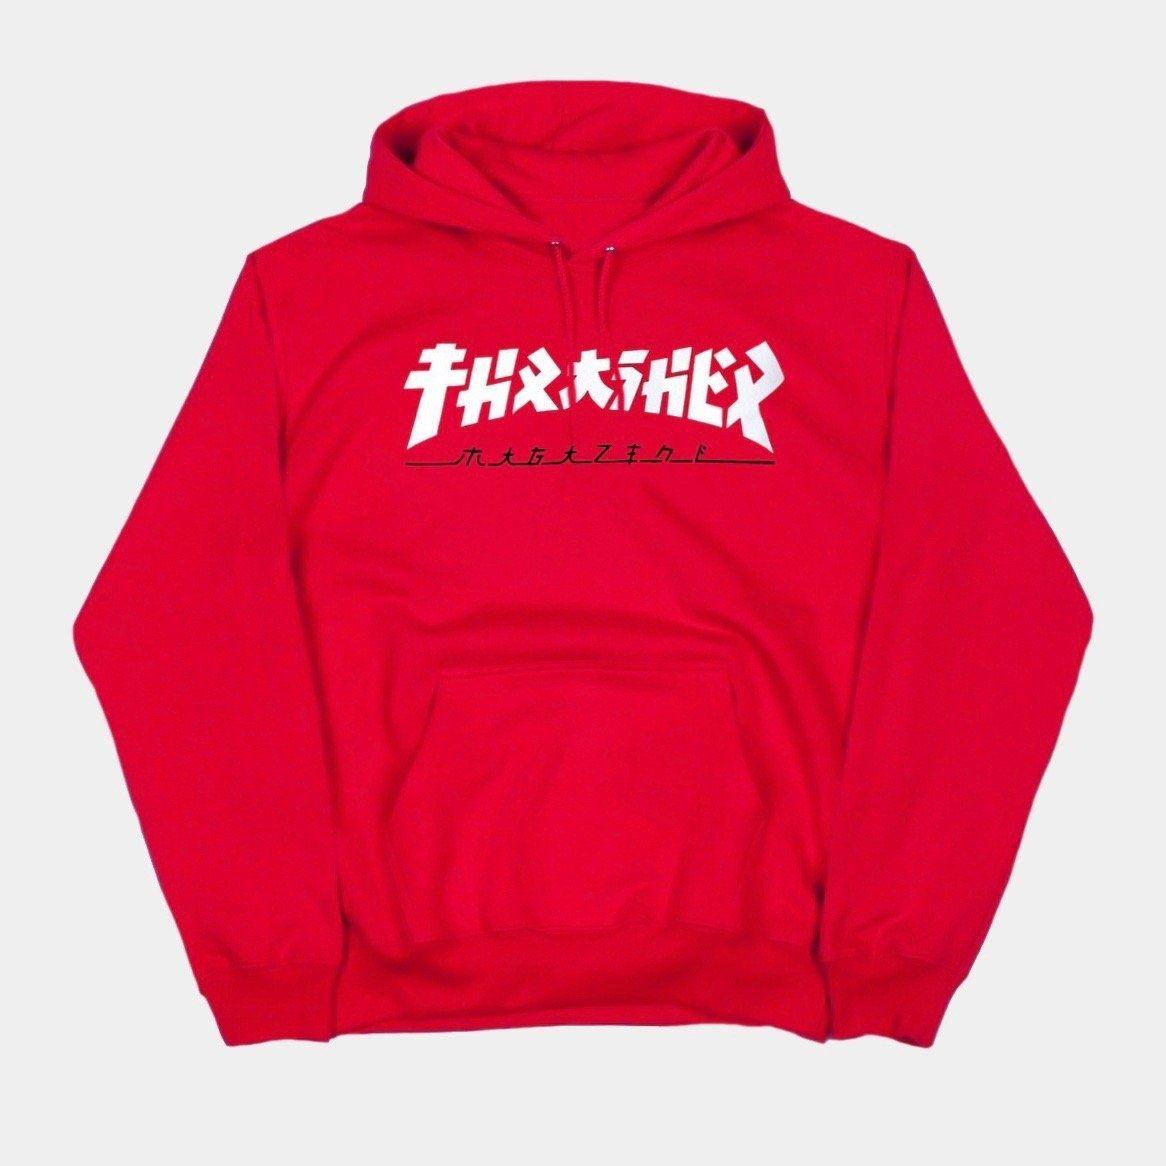 Thrasher Magazine Thrasher Godzilla Hoodie Red Thrasher Thrashermagazine Red Hoodie Hoodies Thrasher Hoodie [ 1166 x 1166 Pixel ]